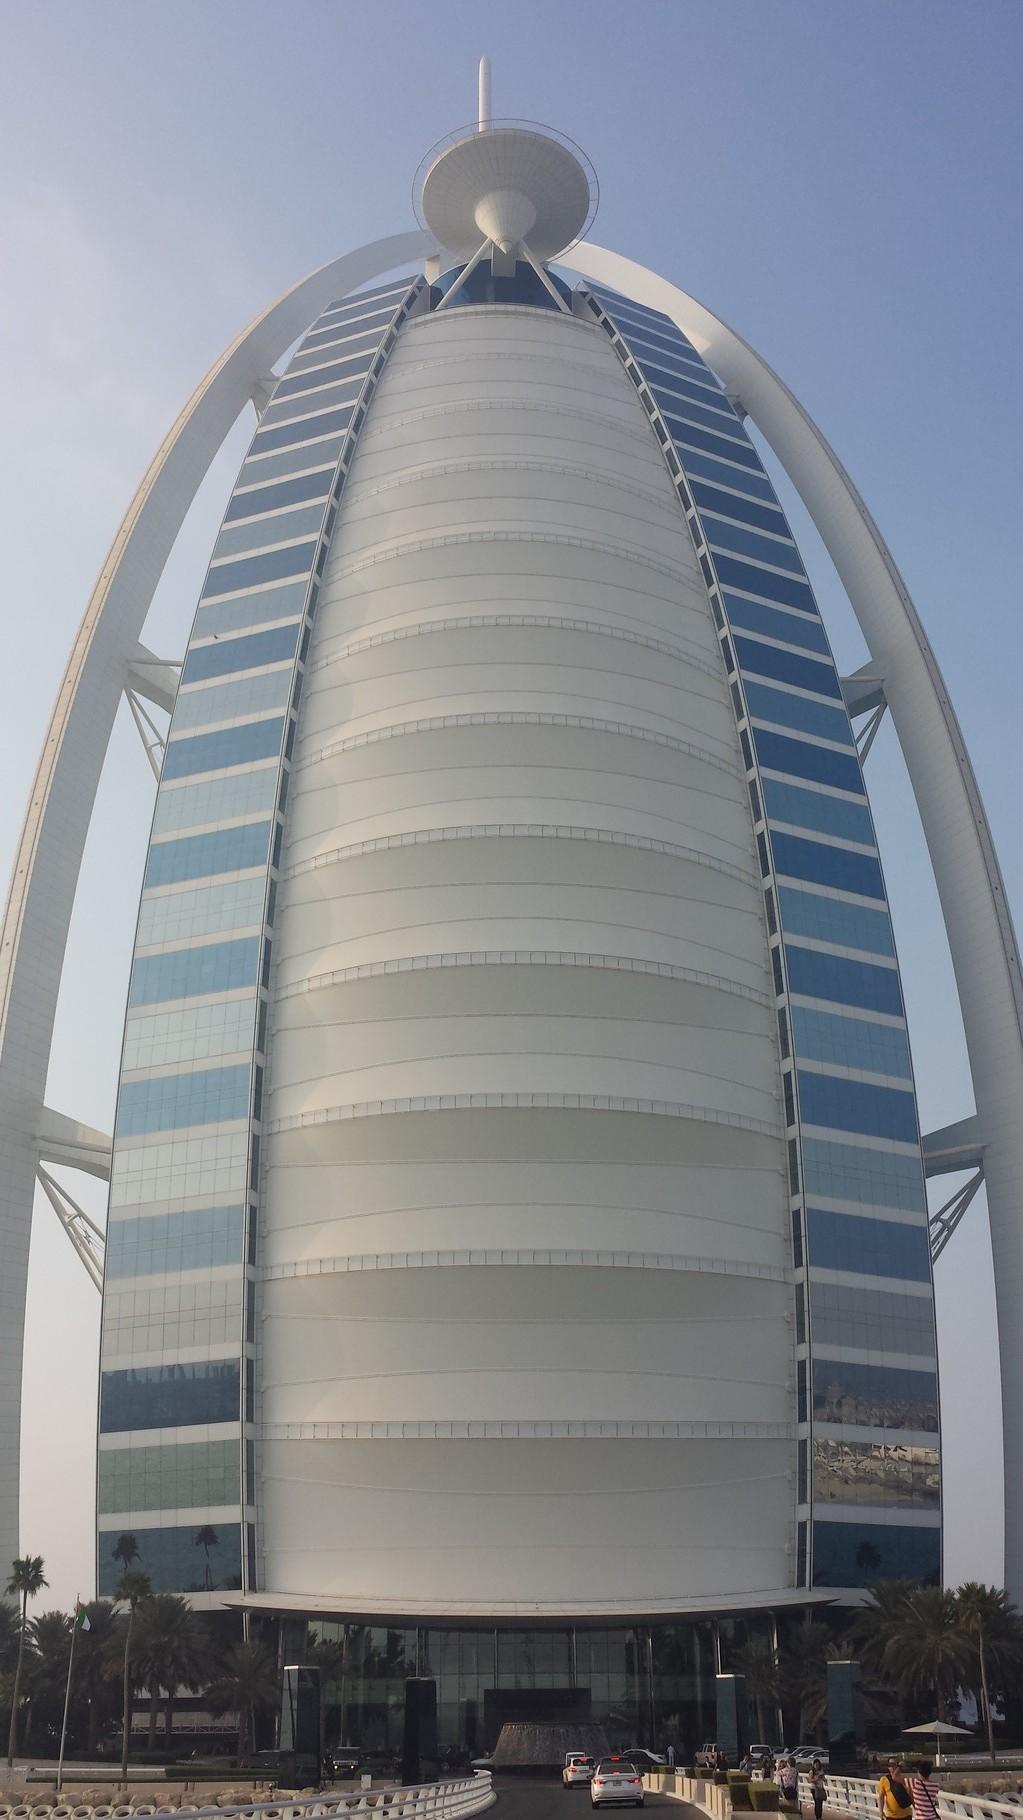 Hotel Bur al Arab